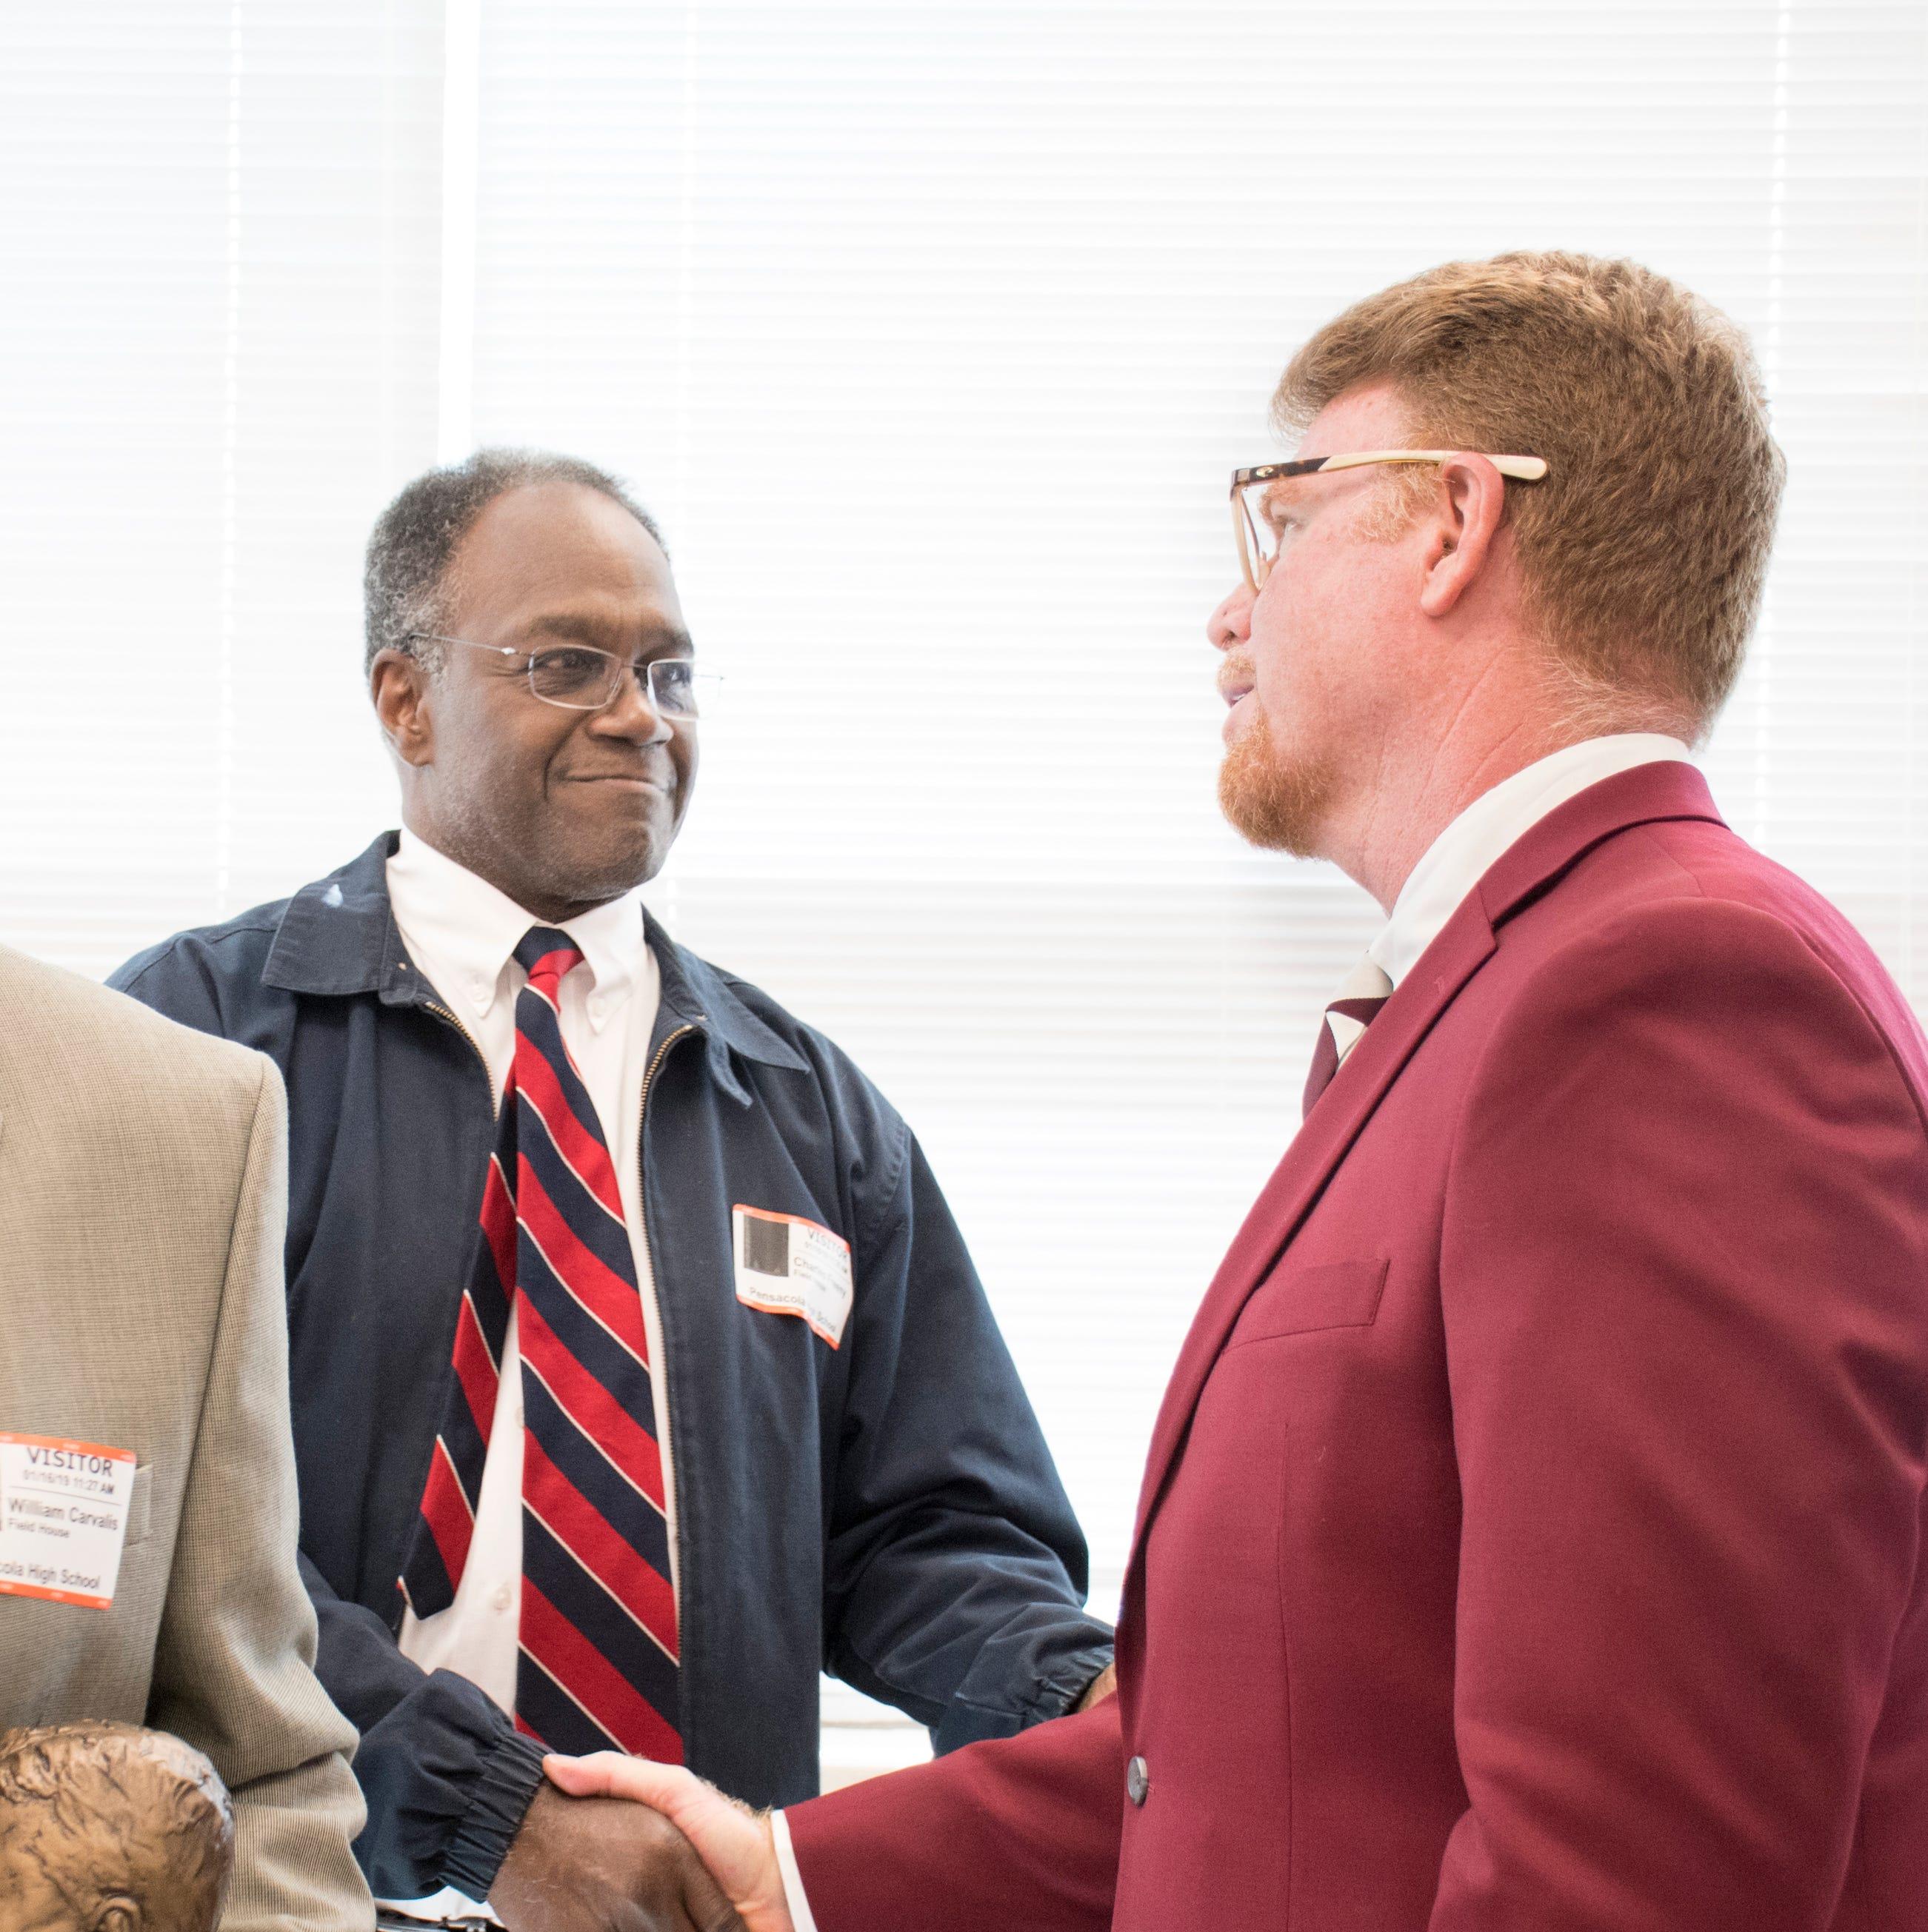 Saga of Pensacola High trailblazers receives new spotlight thanks to Leonard